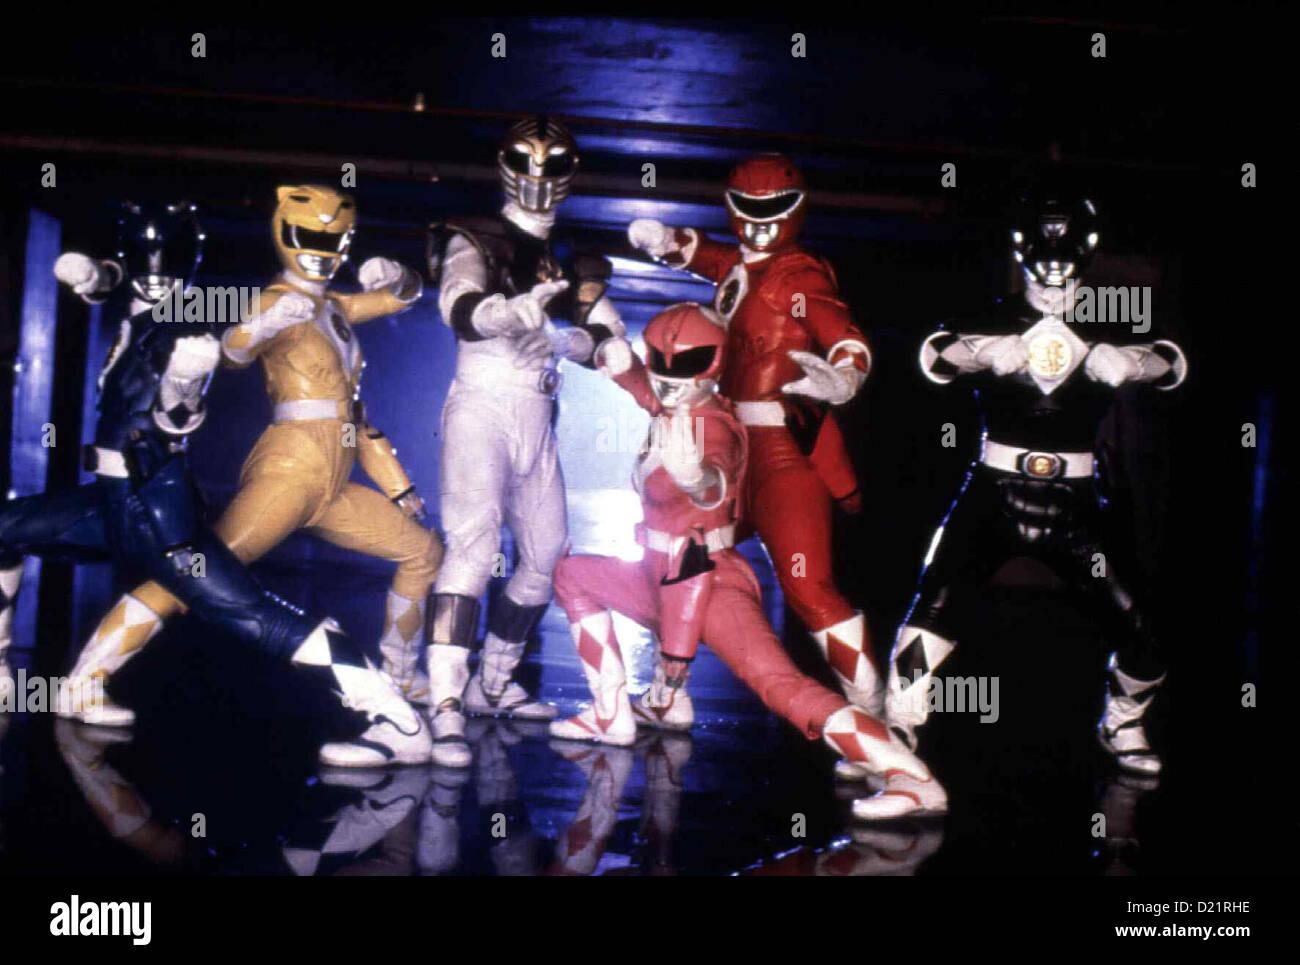 Power Rangers - Der Film  Mighty Morphin Power Rangers - Movie  David Yost, Karan Ashley, Jason David Frank, Amy - Stock Image